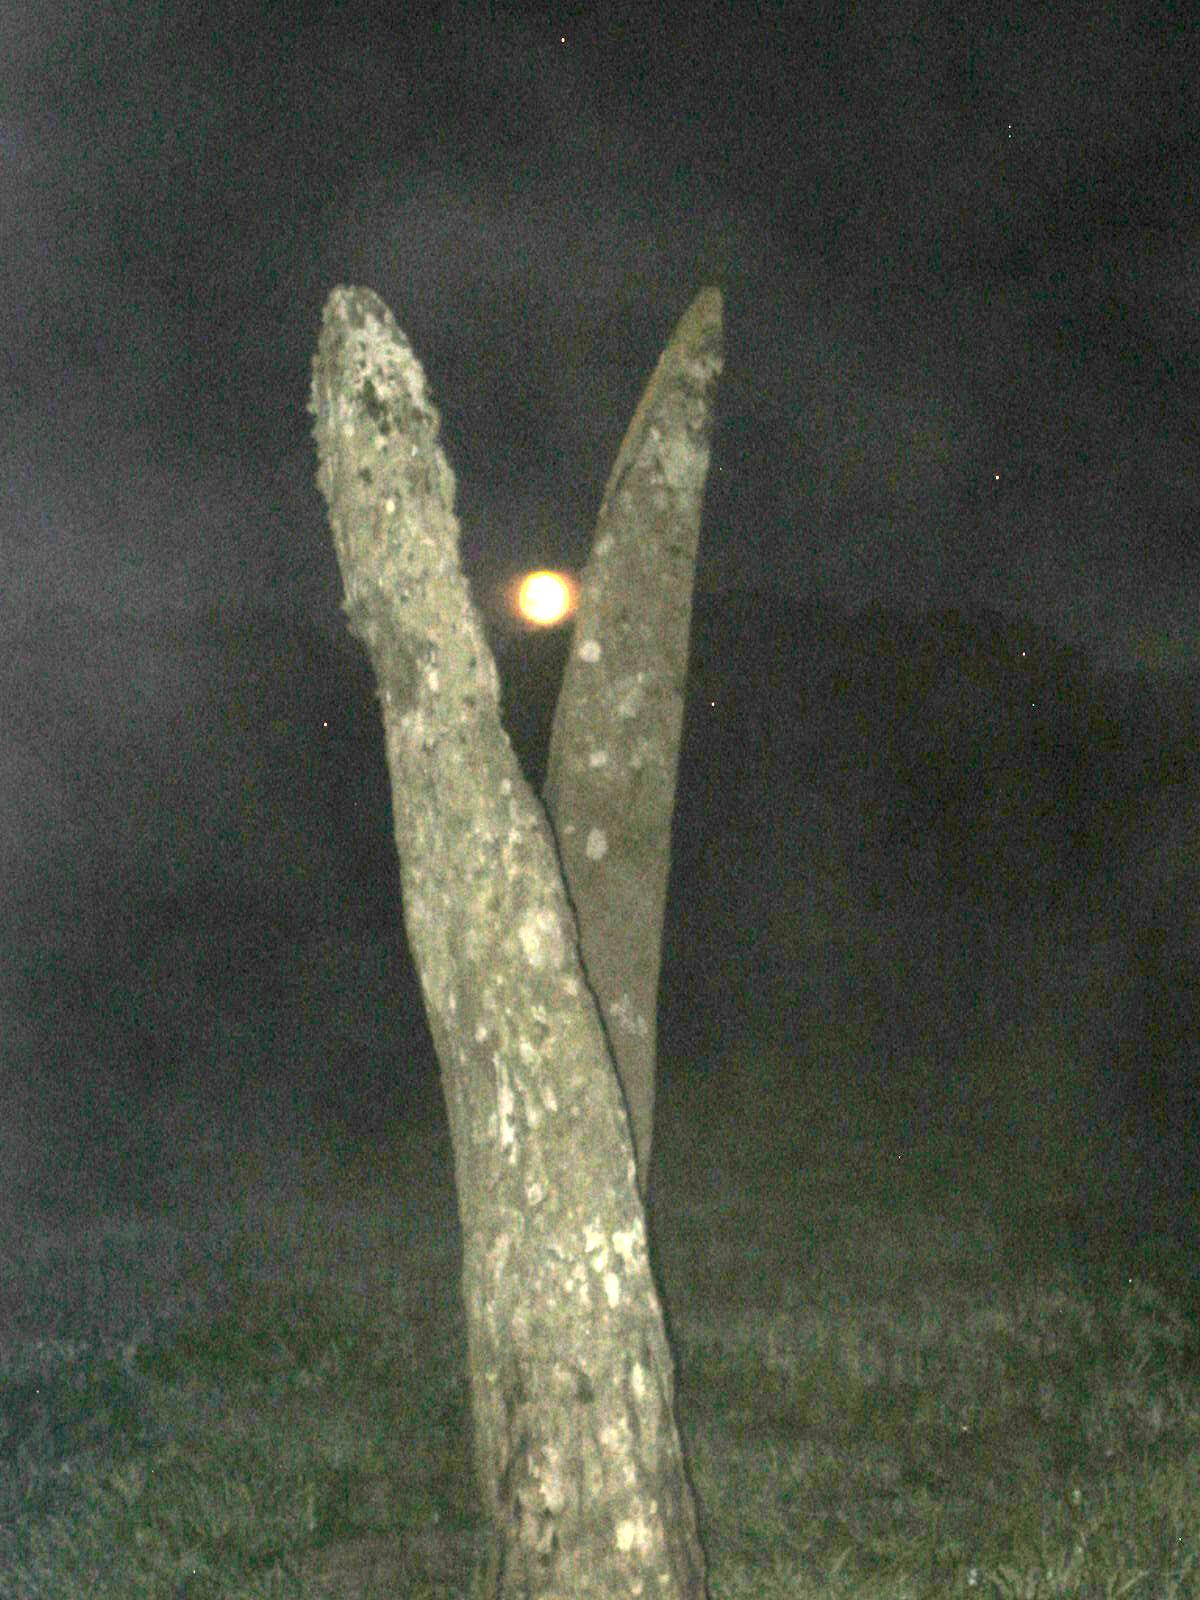 Interstone moon rise